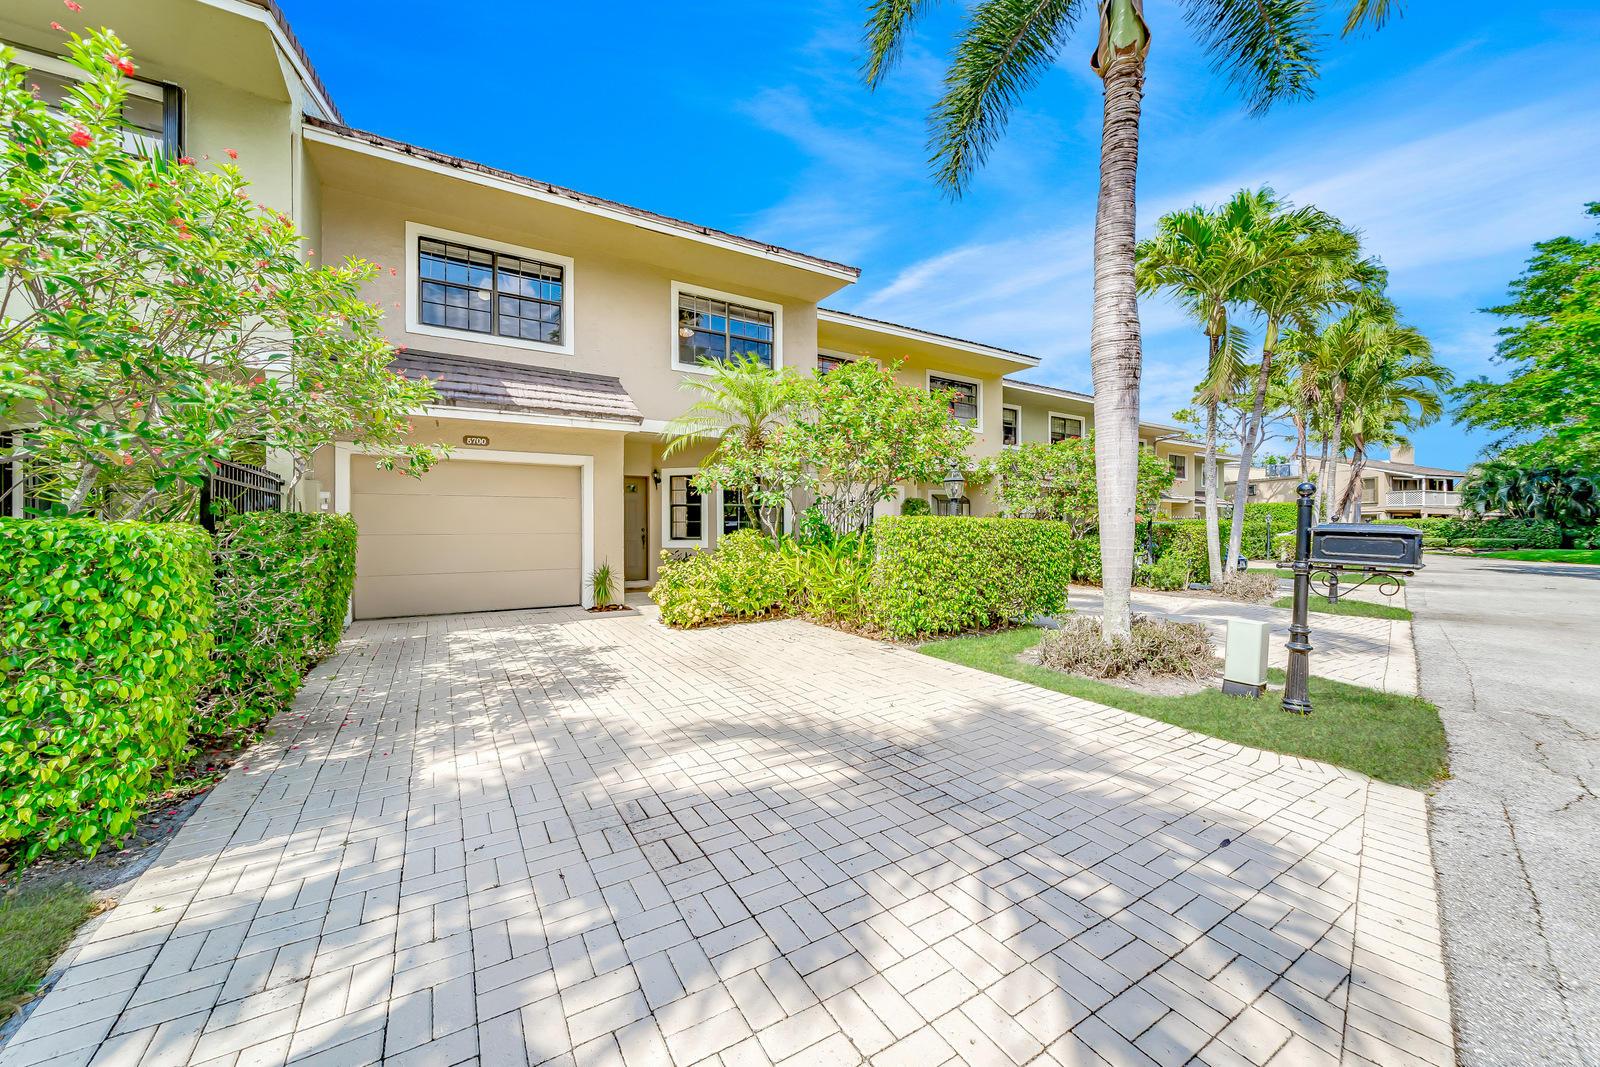 Home for sale in Boca Del Mar Boca Raton Florida